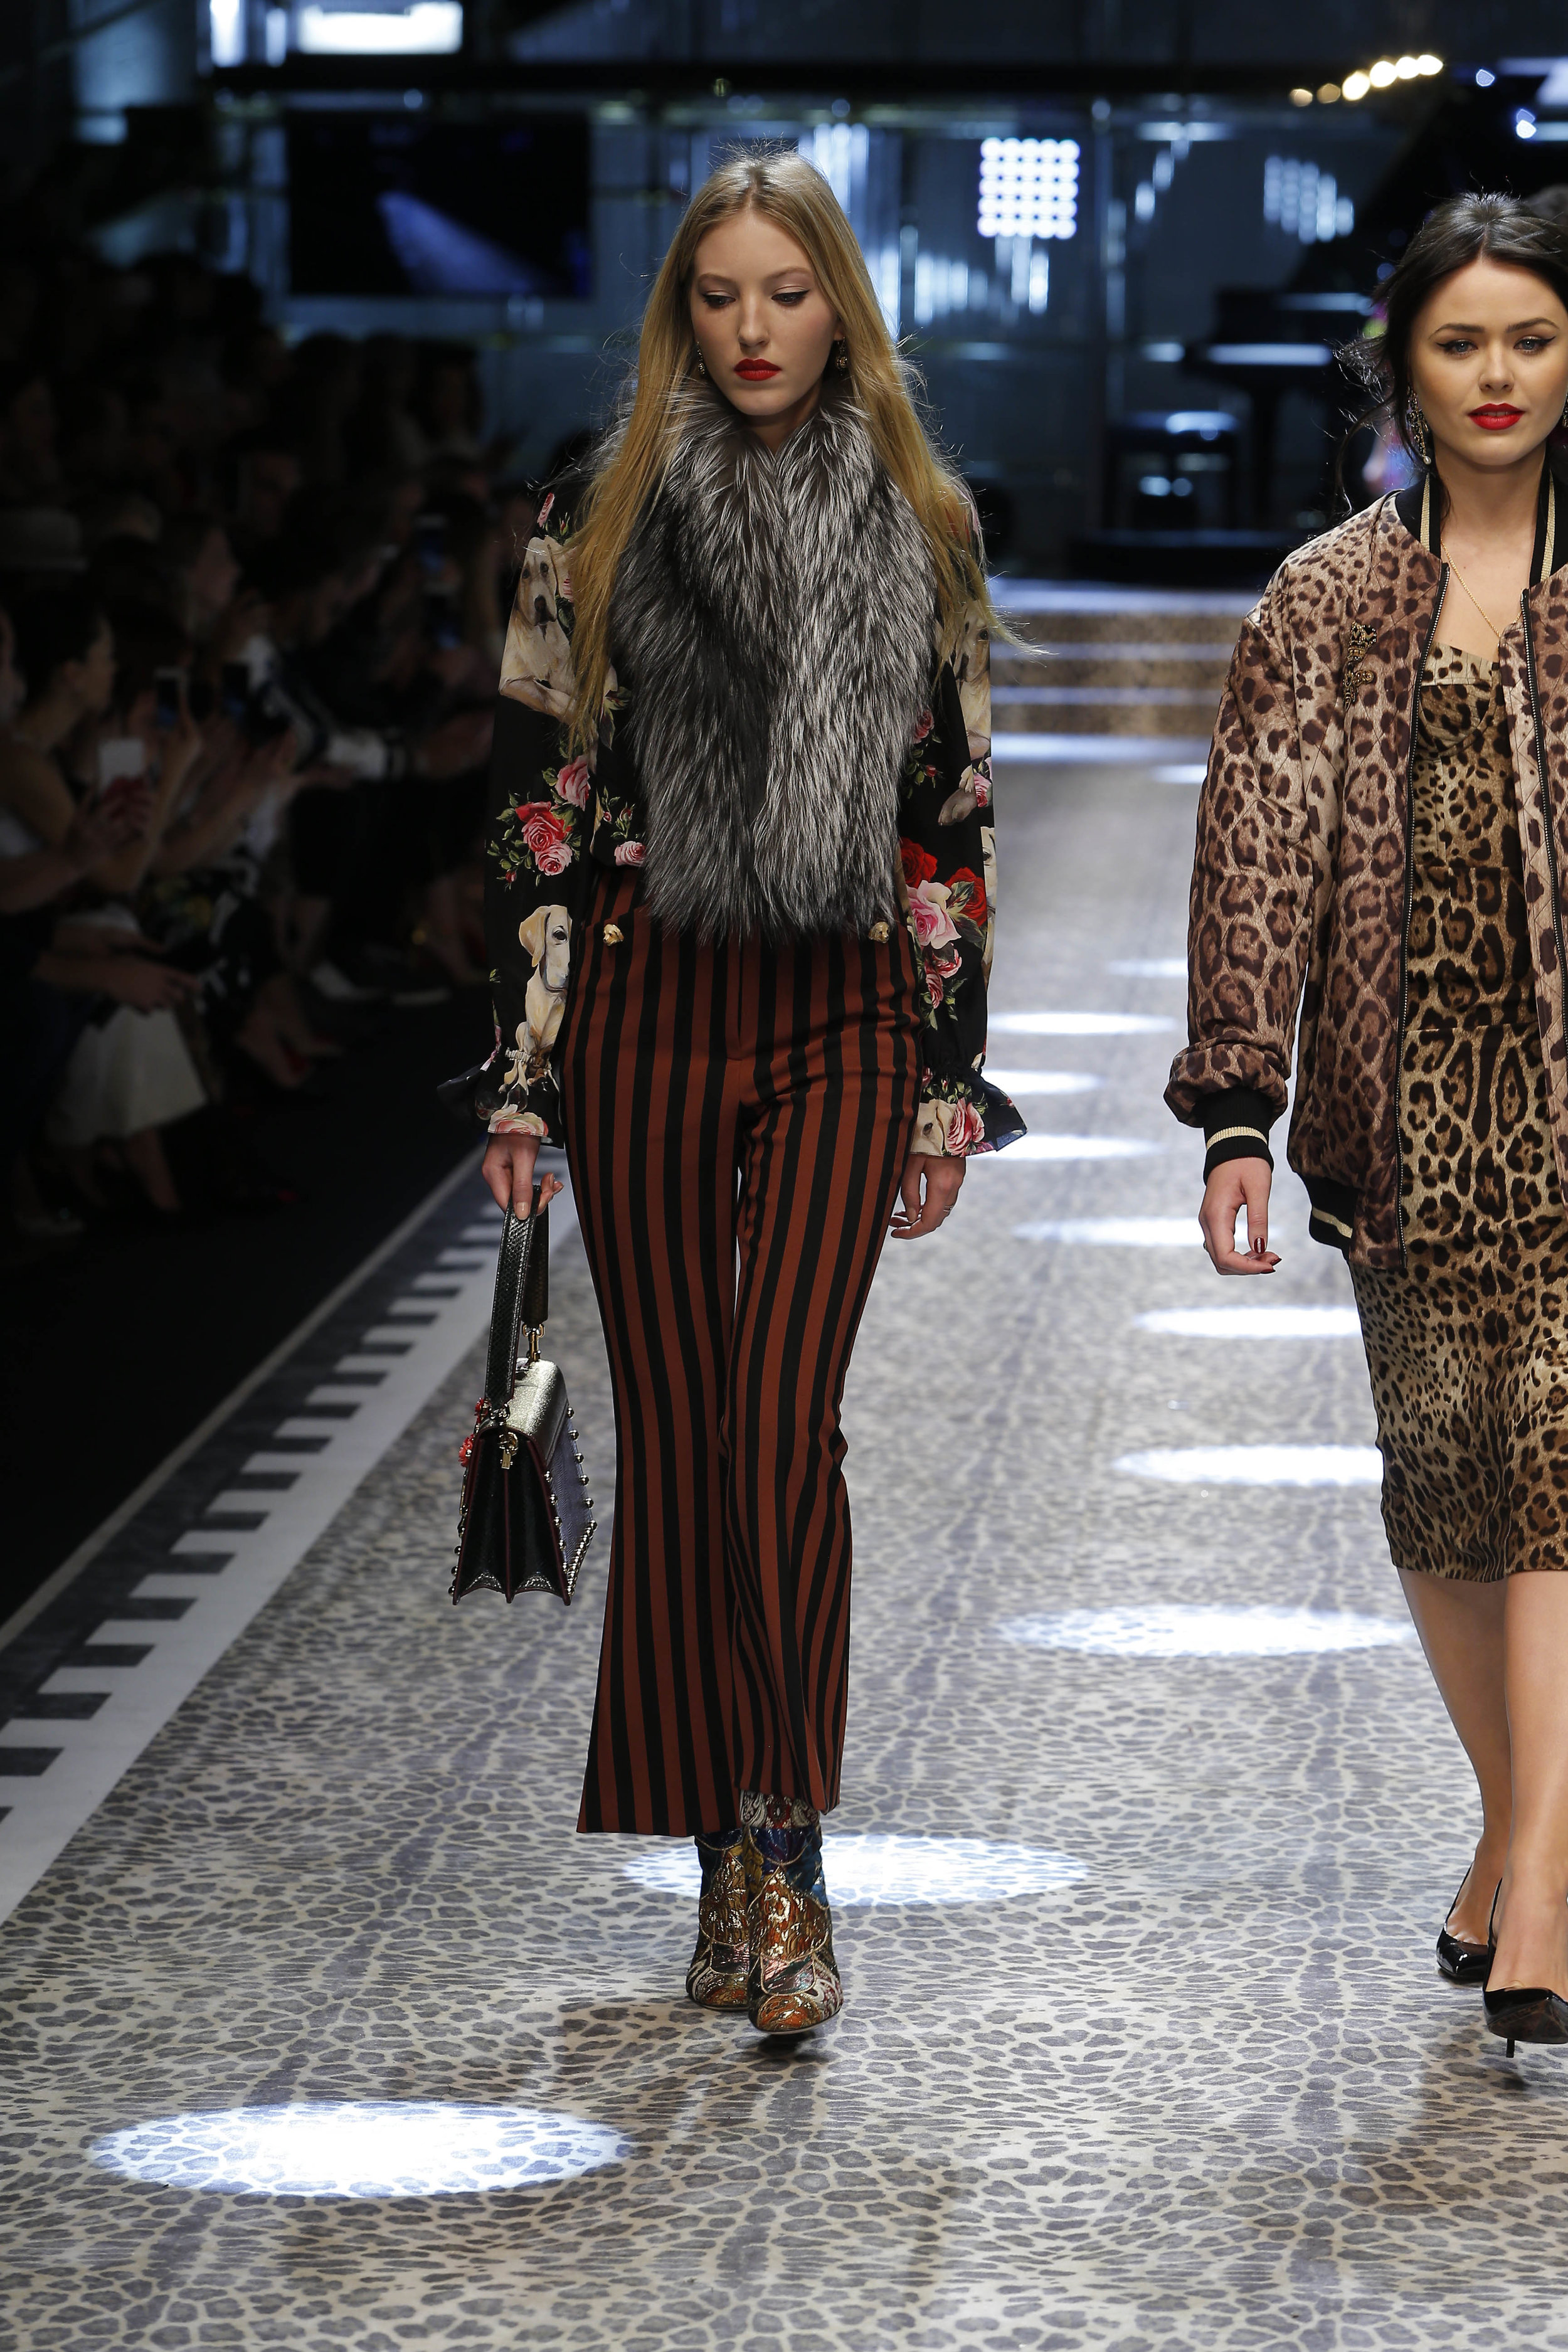 Dolce&Gabbana_women's fashion show fw17-18_Runway_images (63).jpg